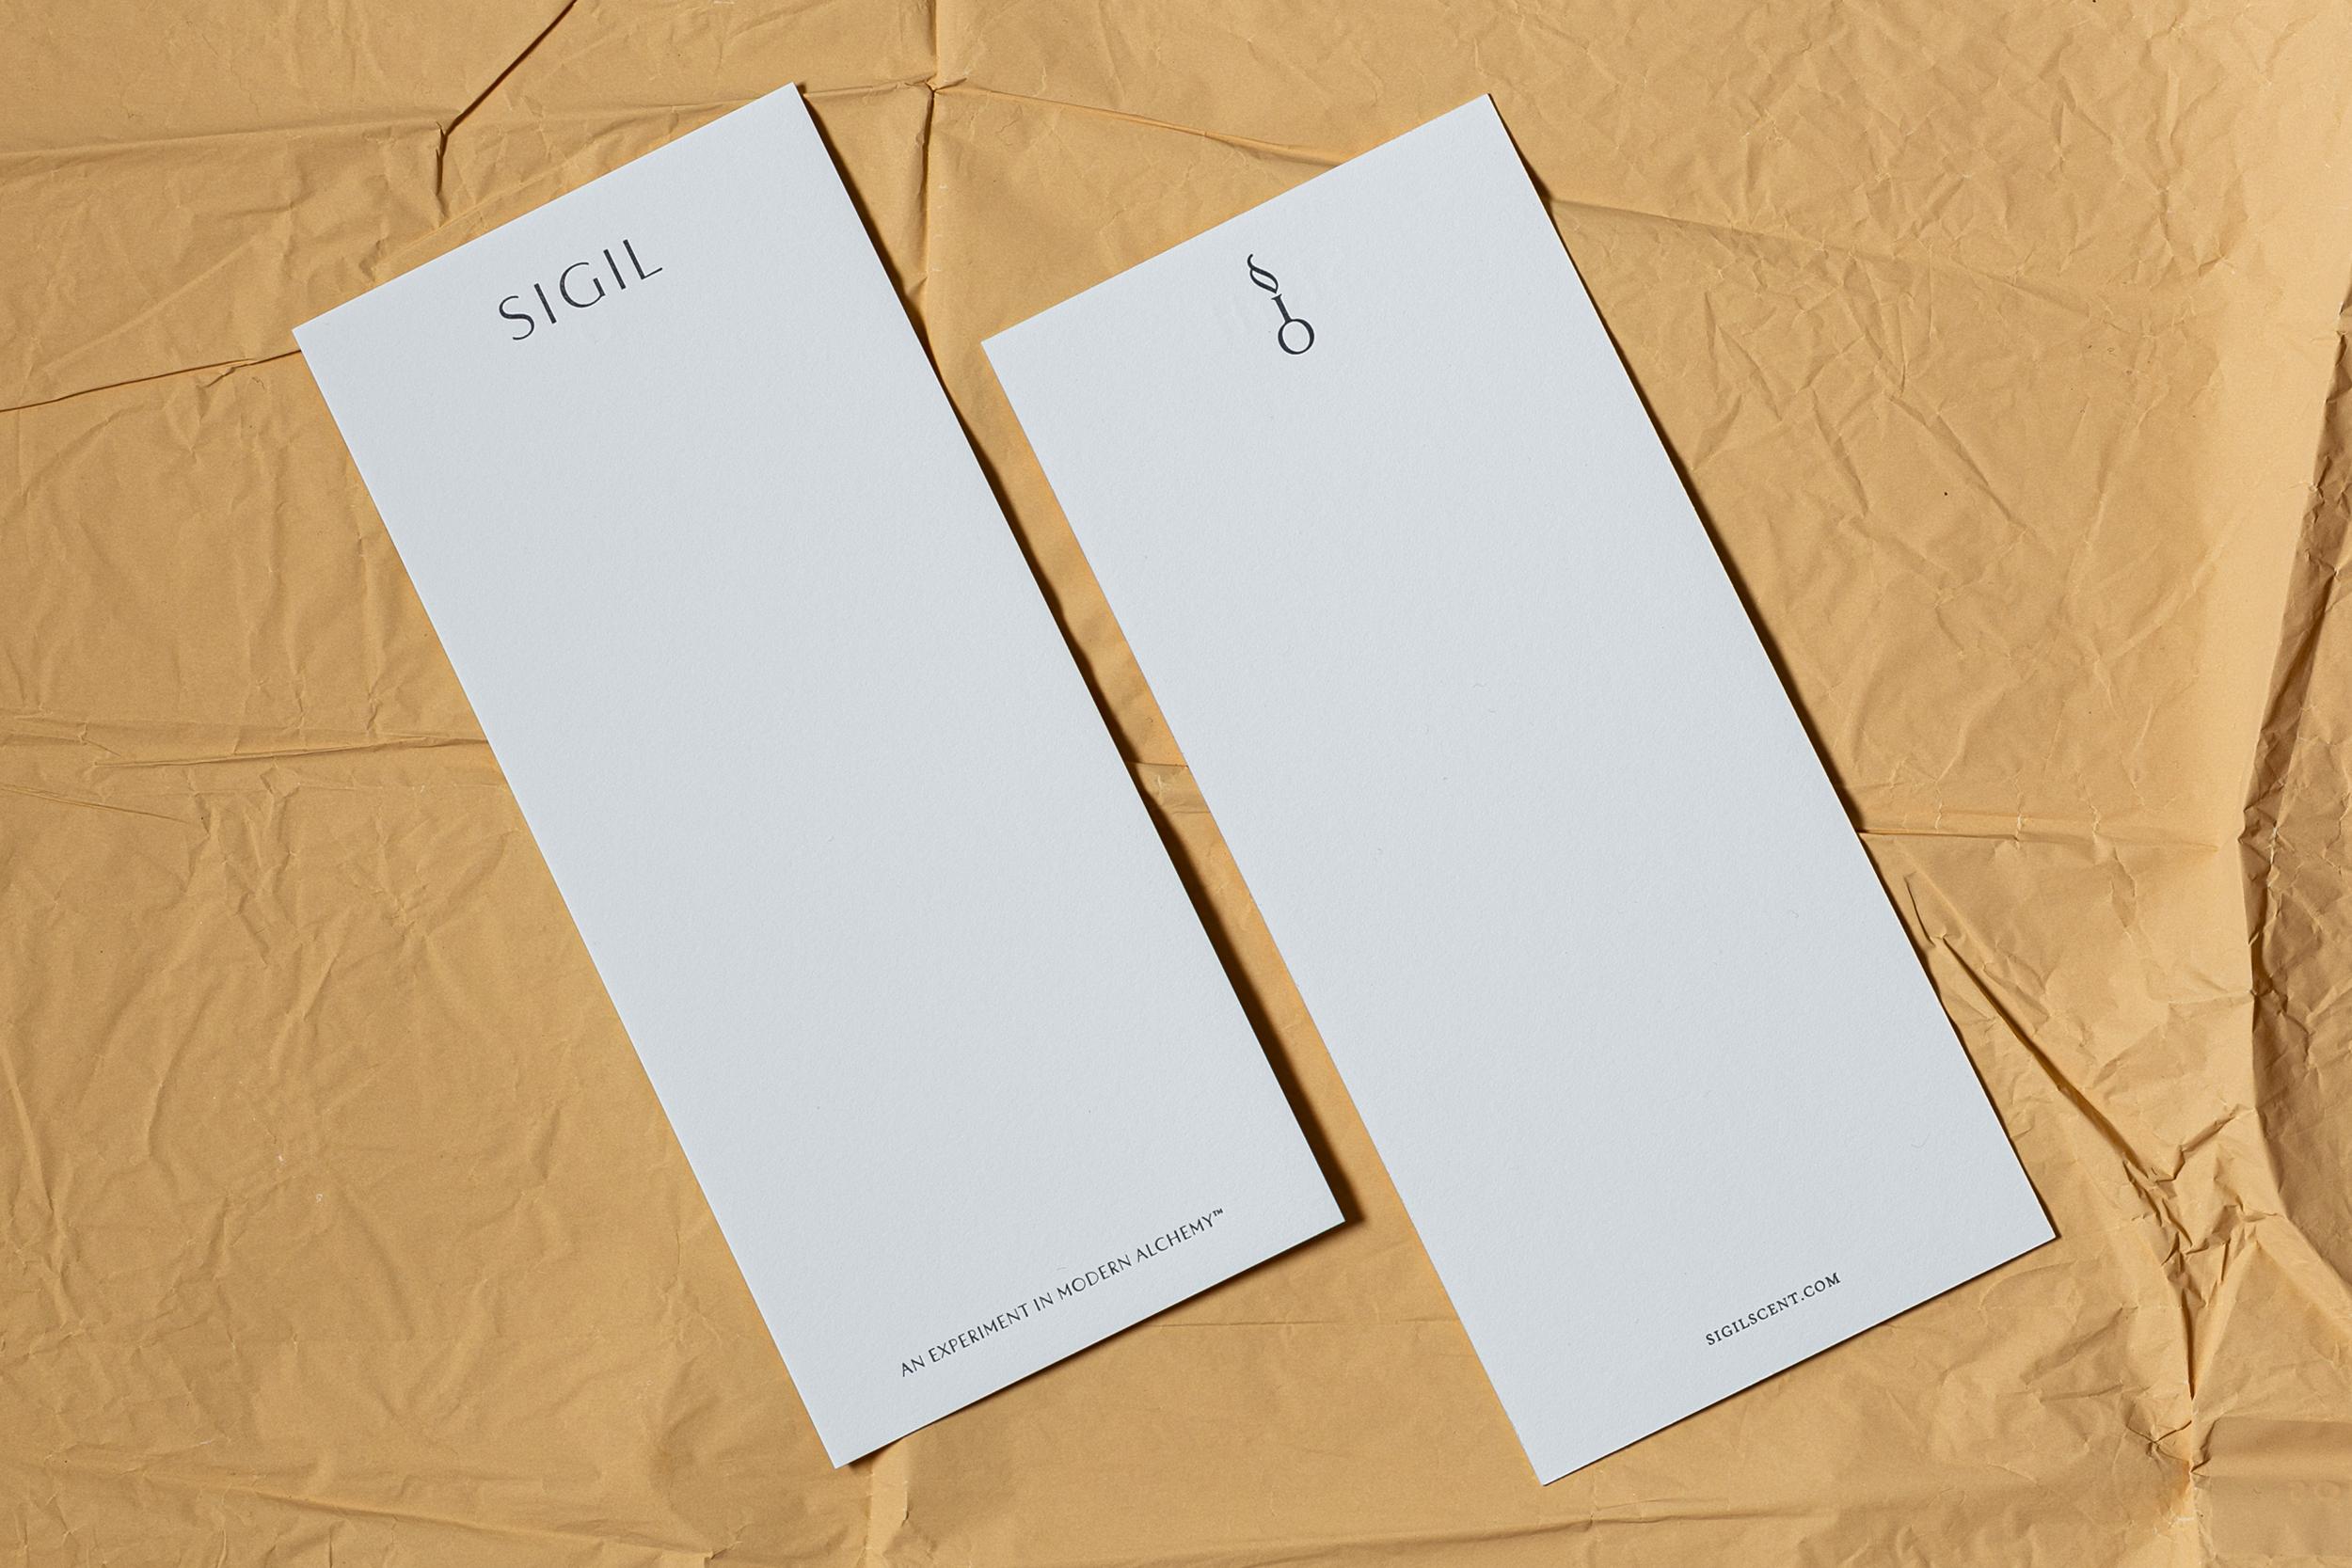 Sigil-note-card.jpg